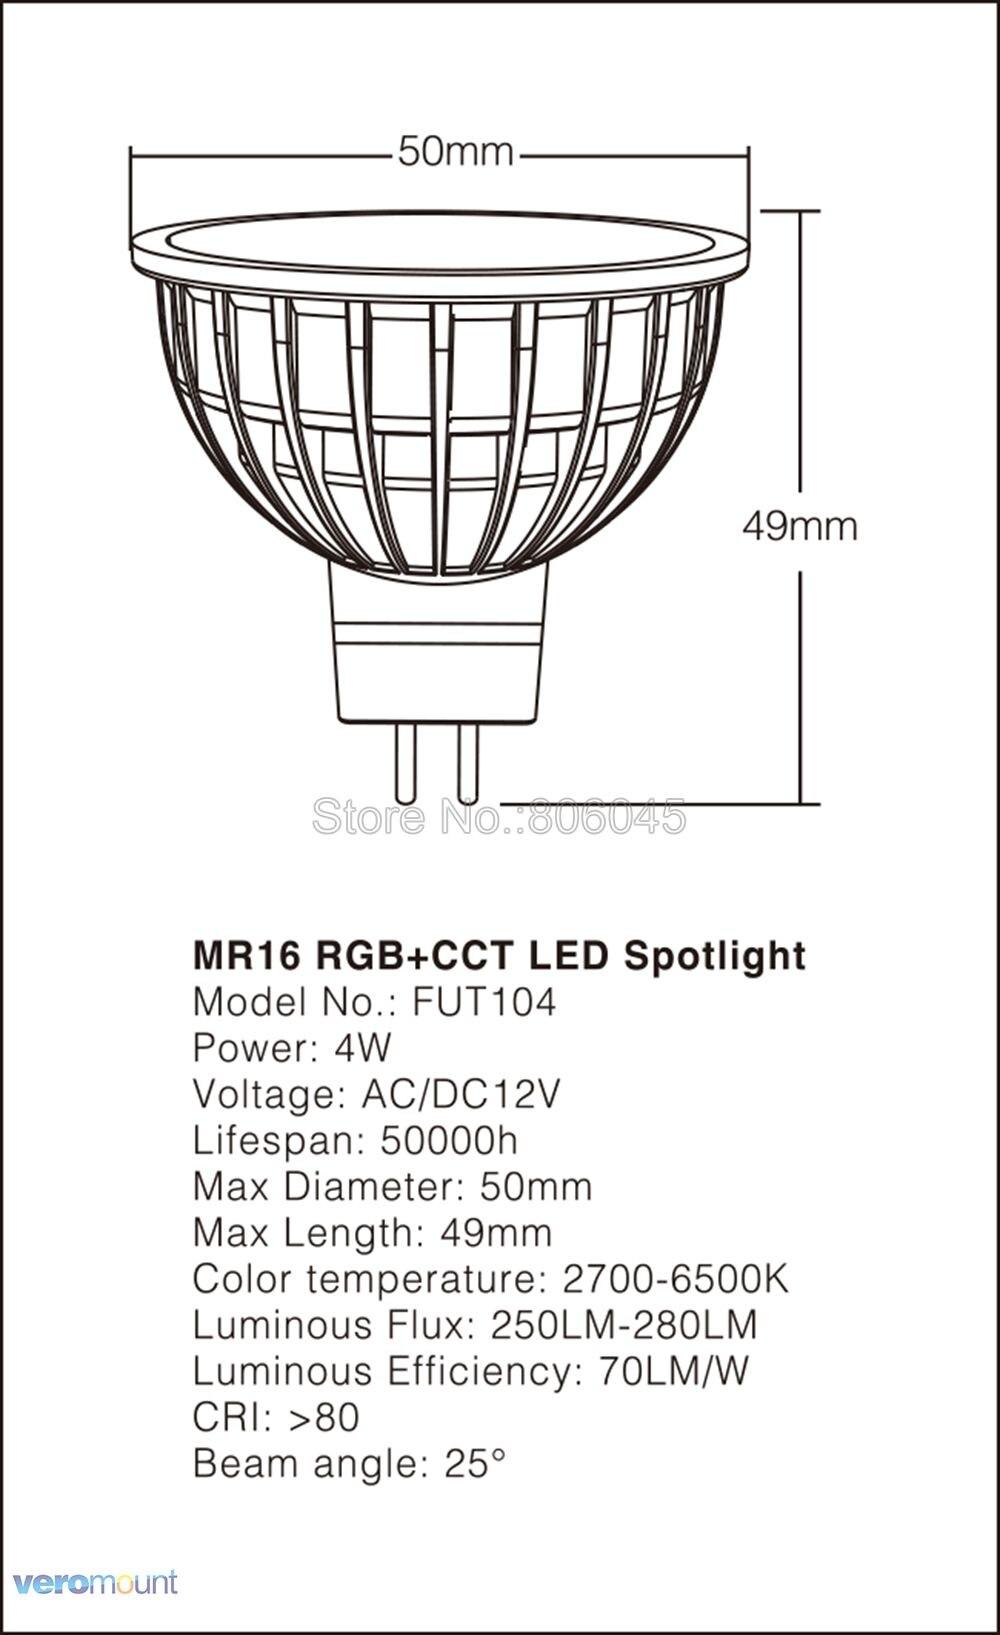 smart wifi led spotlight fut103 2.4g rf controle remoto sem fio